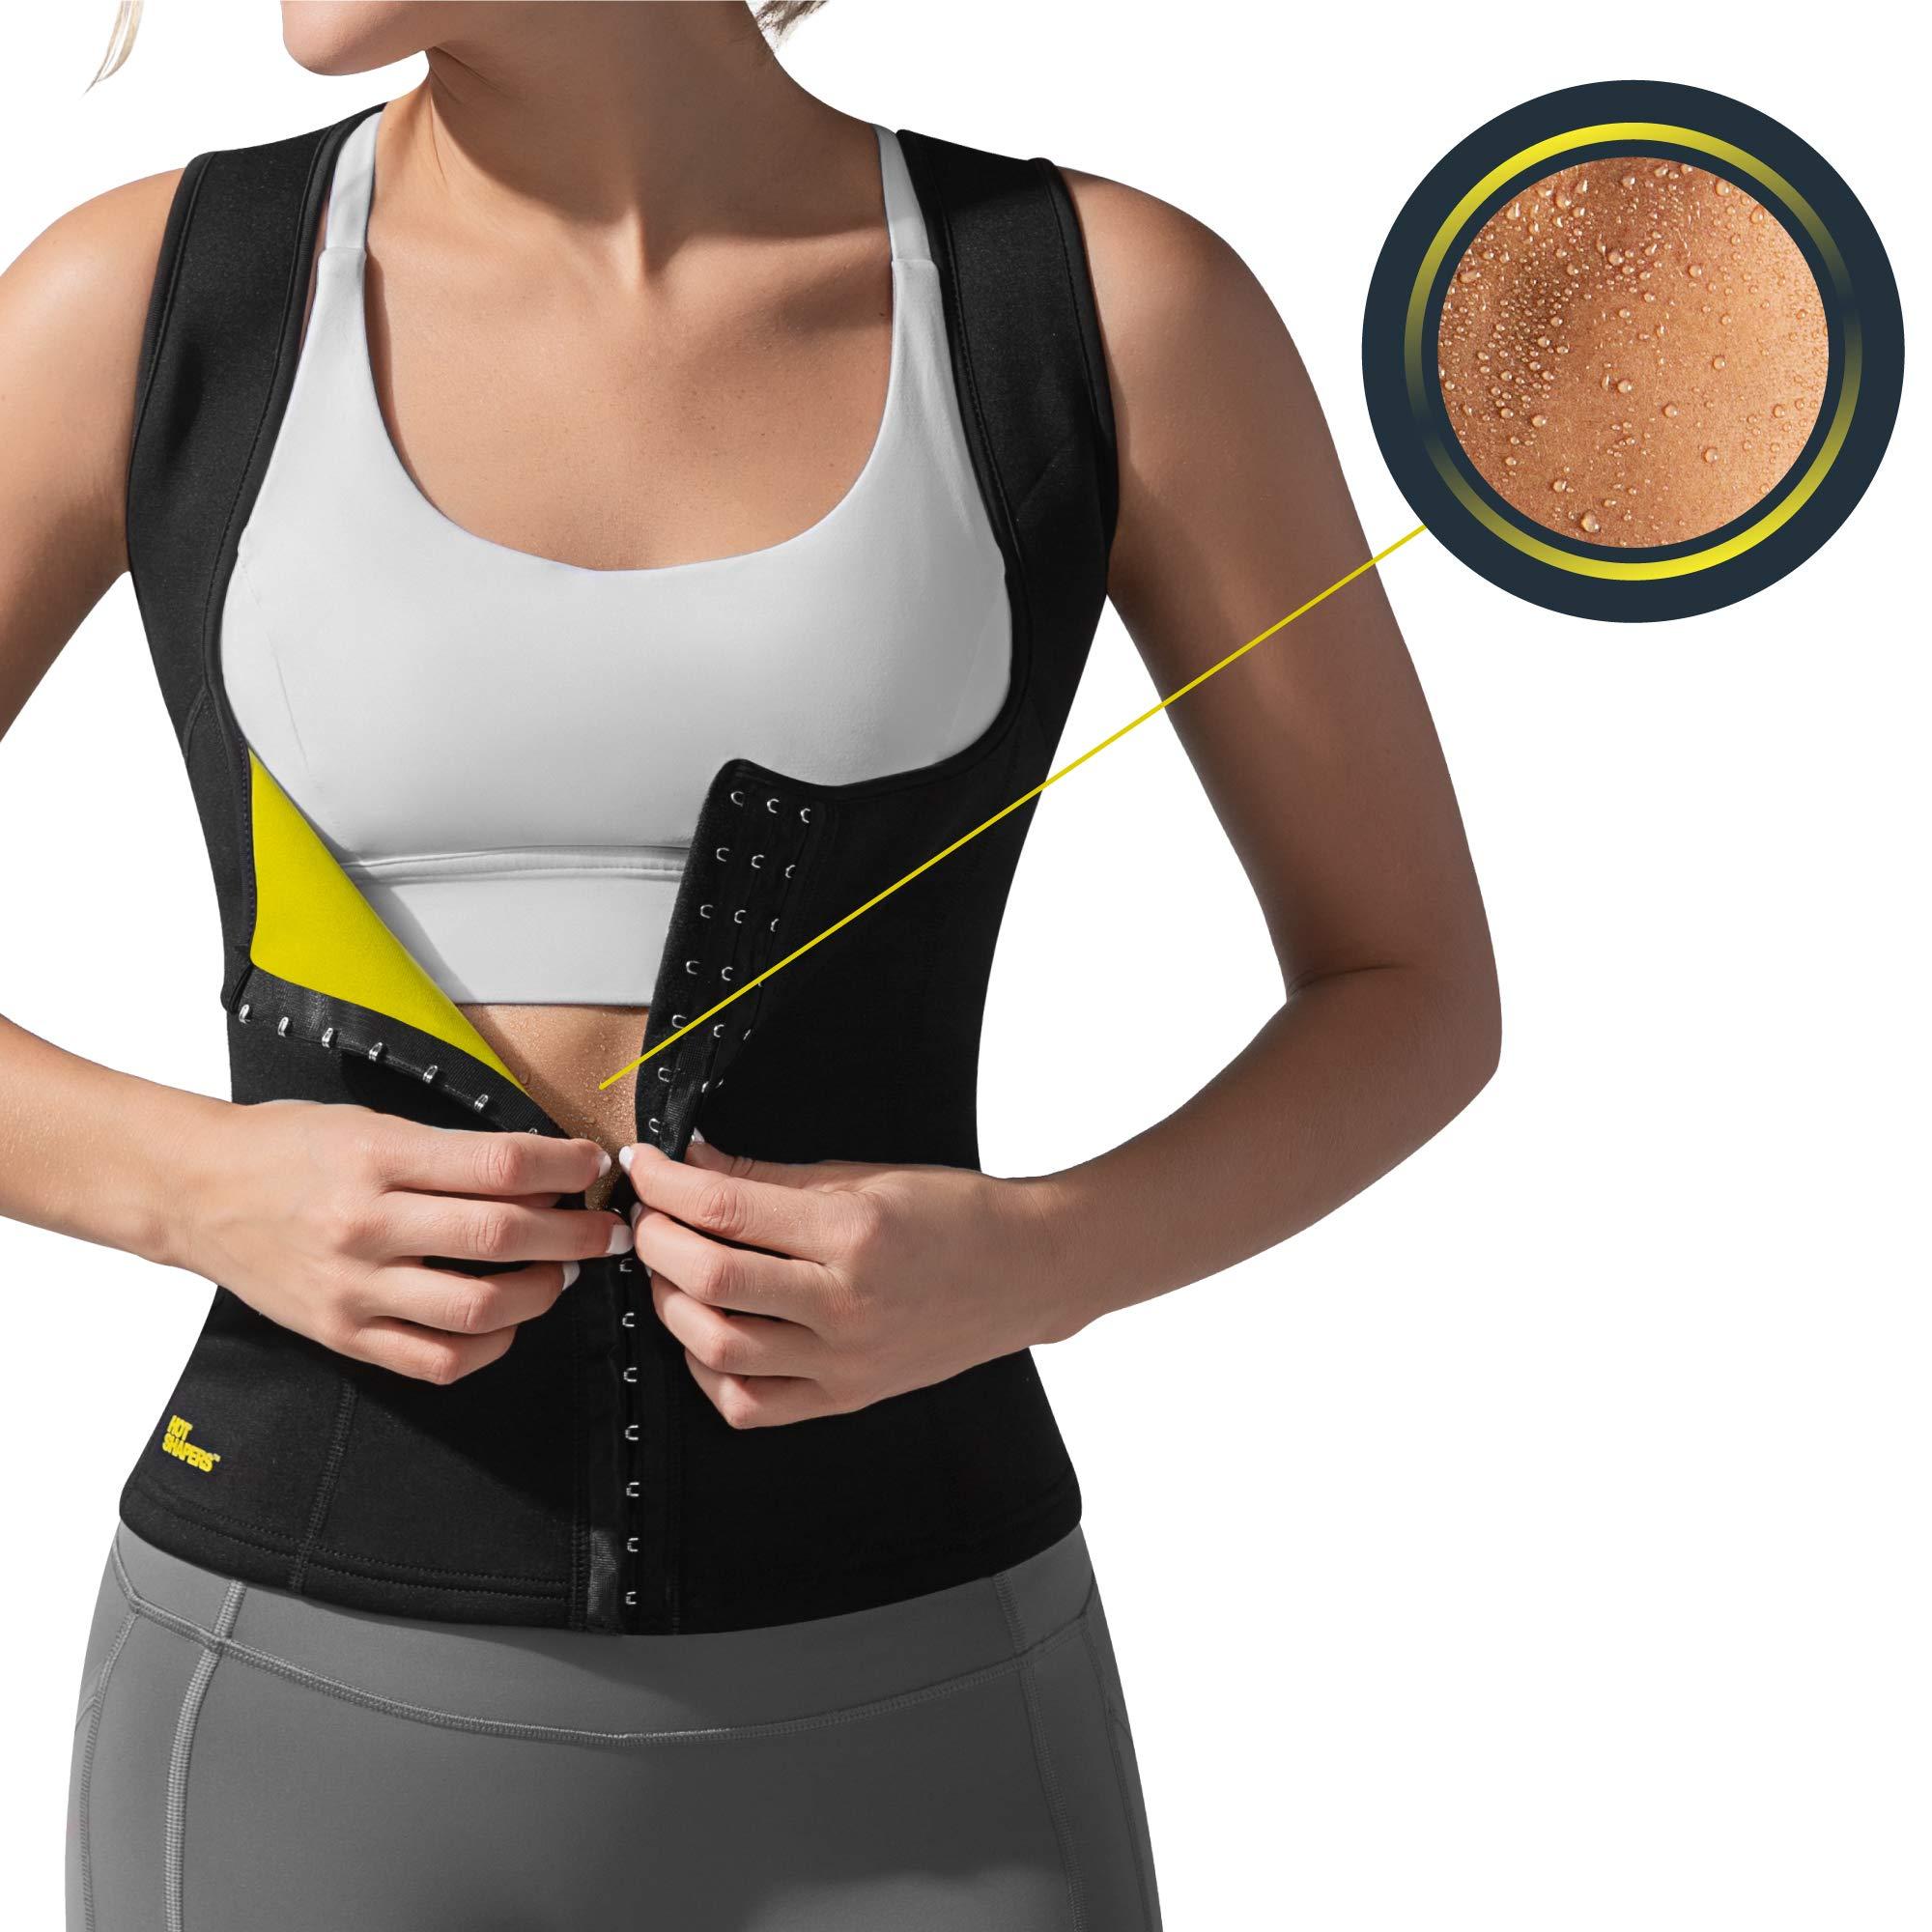 HOT SHAPERS Cami Hot Waist Cincher – Women Slimming Sweat Vest & Sauna Body Shaper (Small, Black)